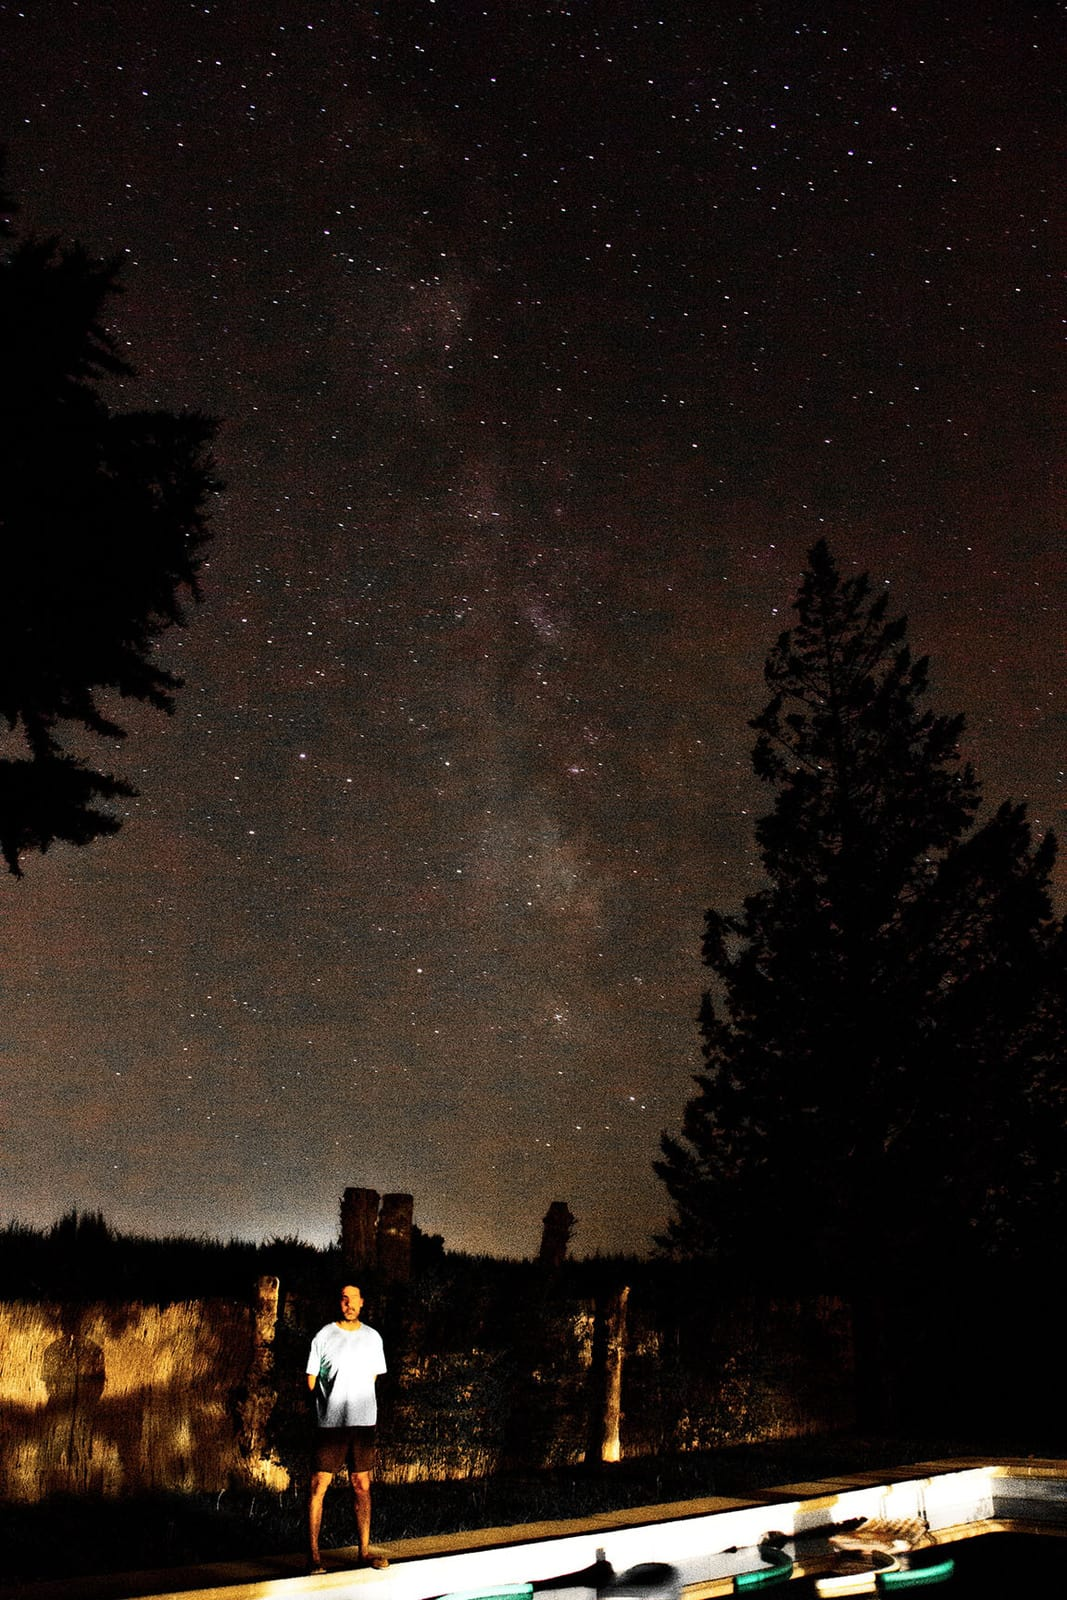 1439905158_galaxia 2